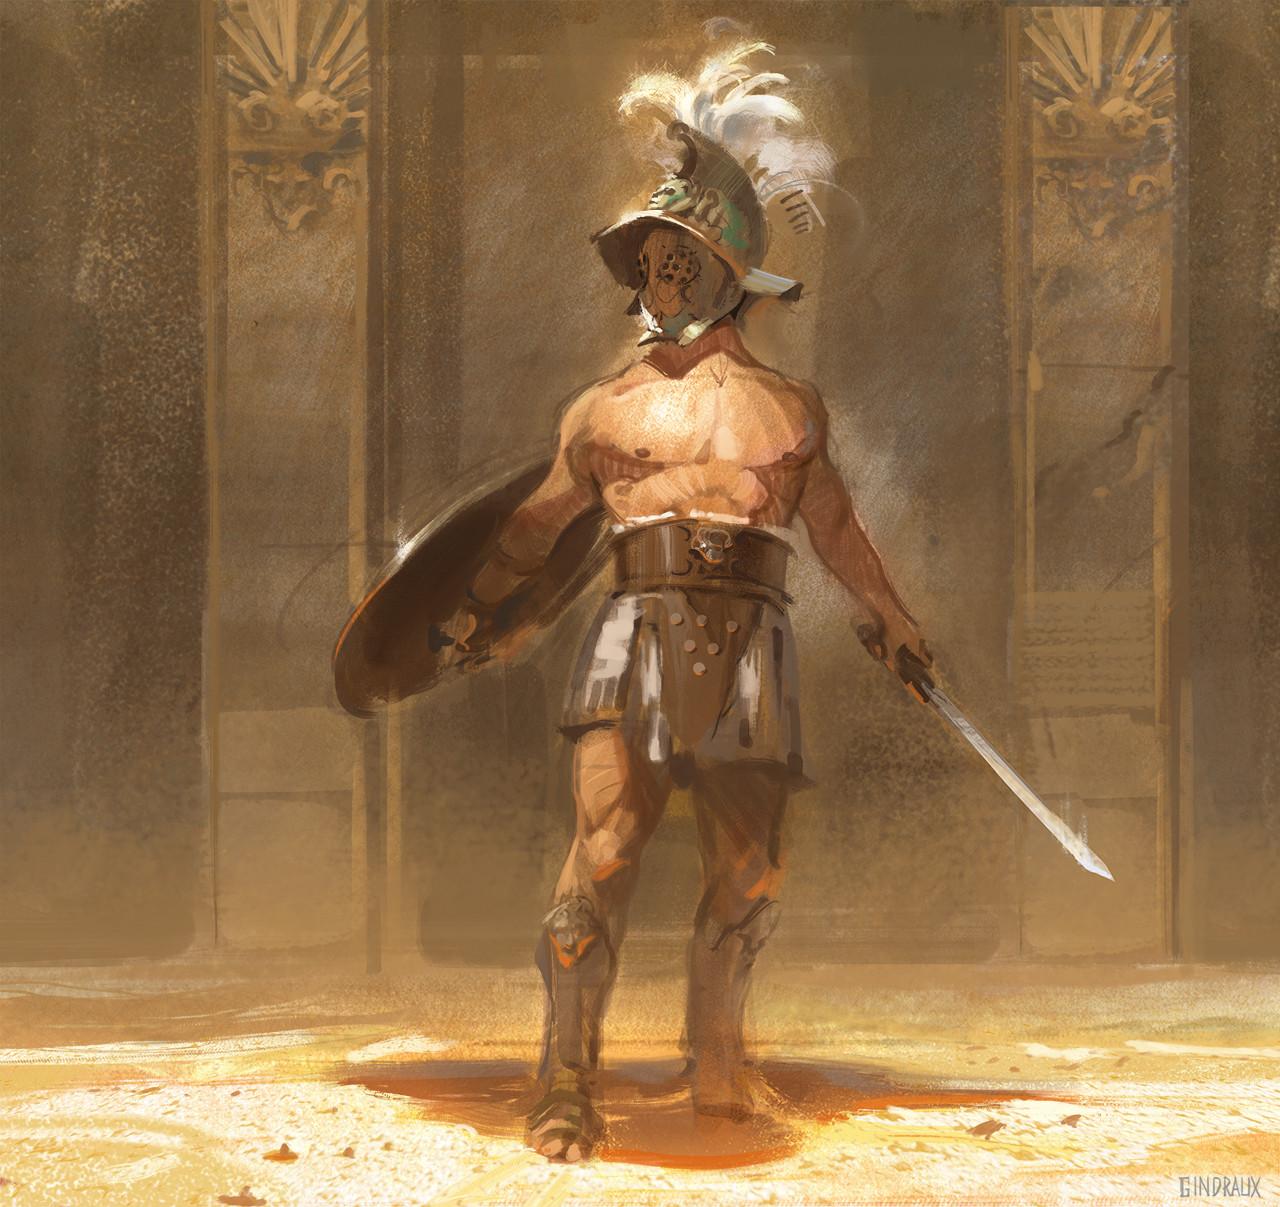 Nick gindraux gladiator1 artstation